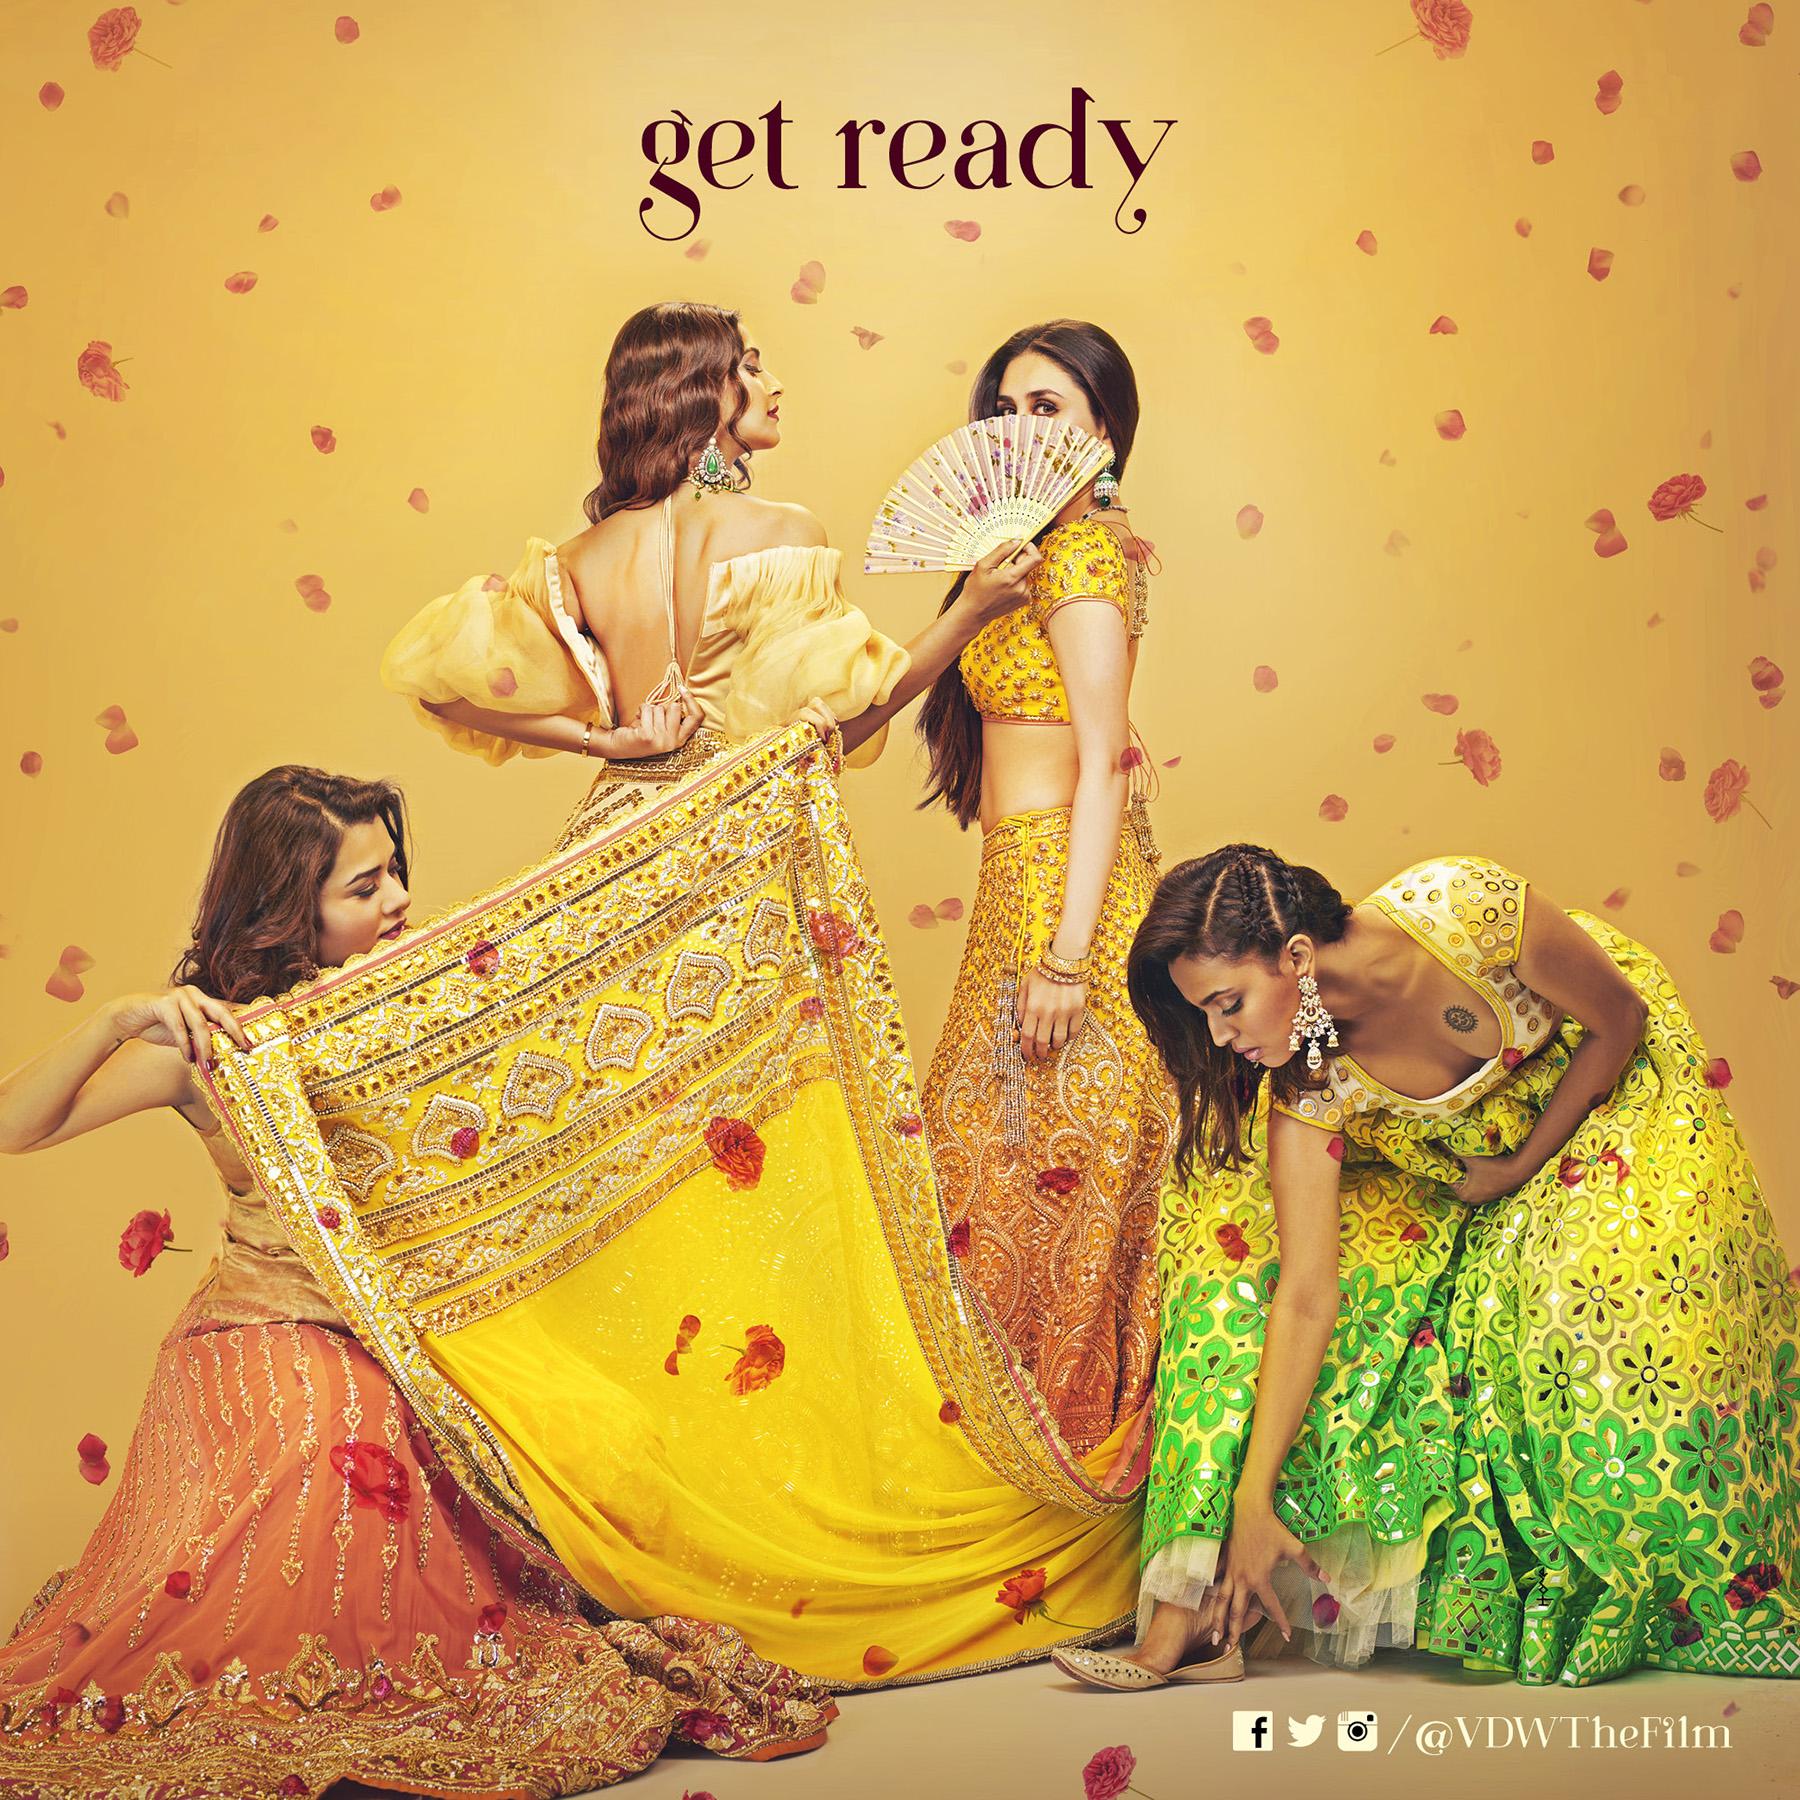 Veere-Di-Wedding-Teaser-Kareena-Kapoor-Khan-Sonam-Kapoor-Swara-Bhaskar-and-Shikha-Talsania-bring-sexy-back_0